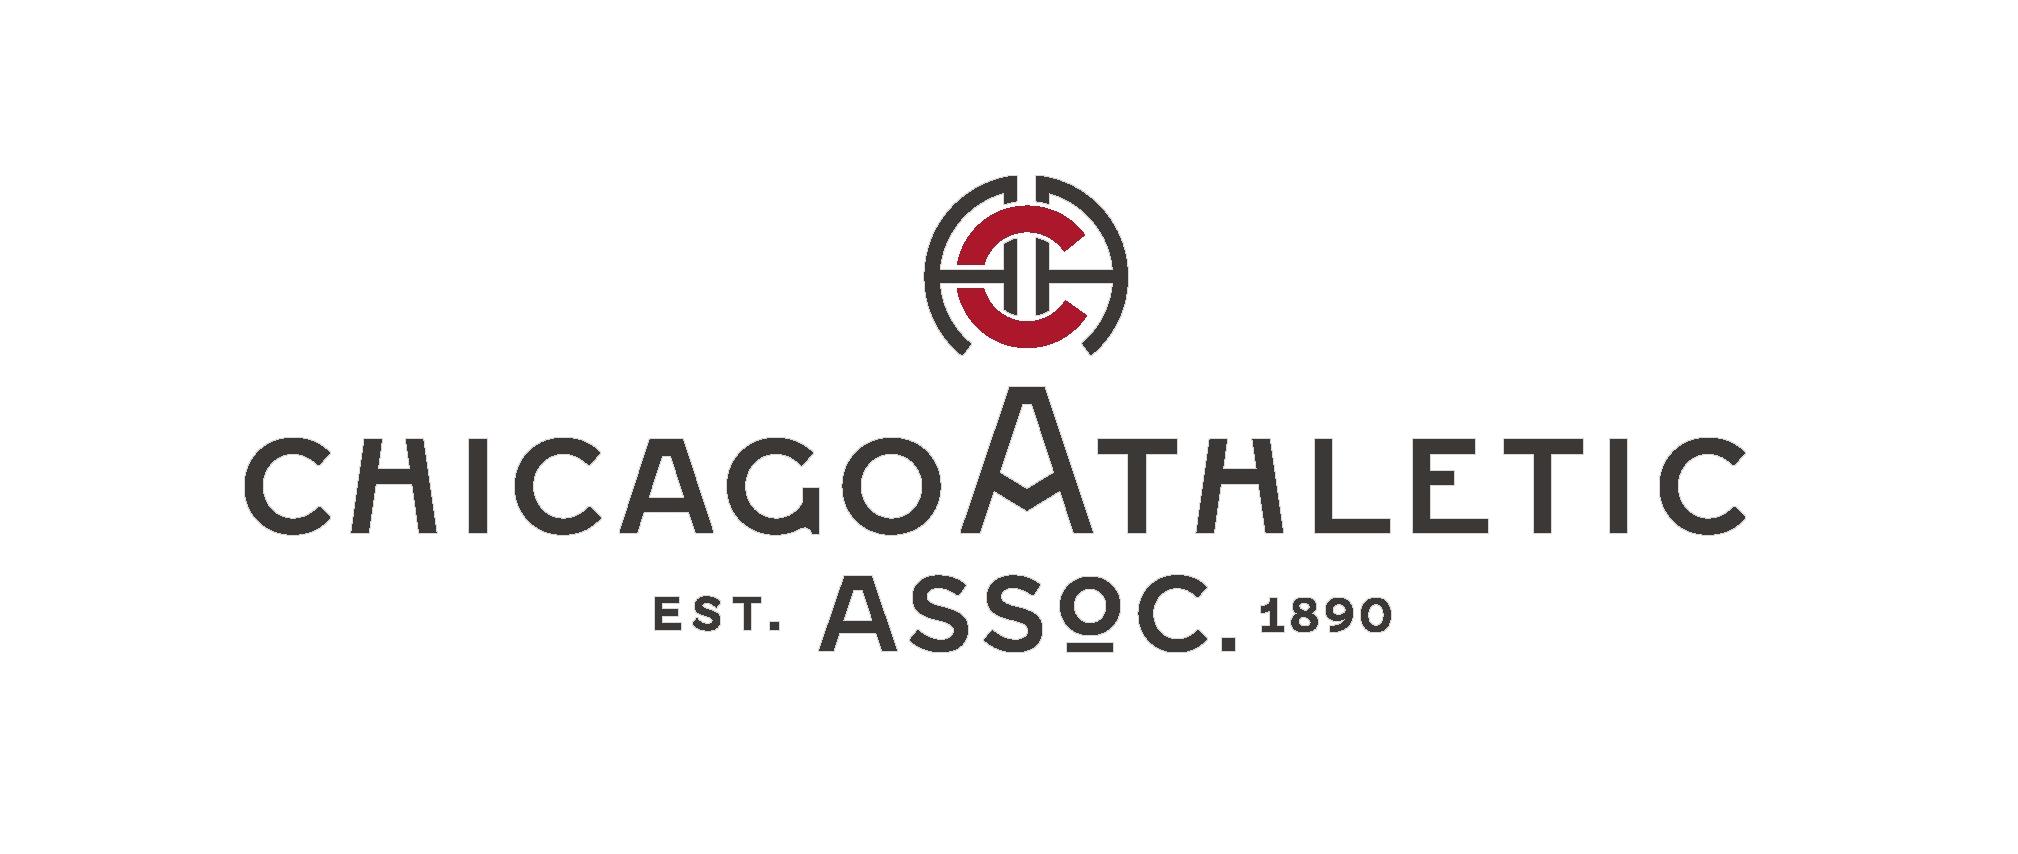 Chicago Athletic Assoc.jpg